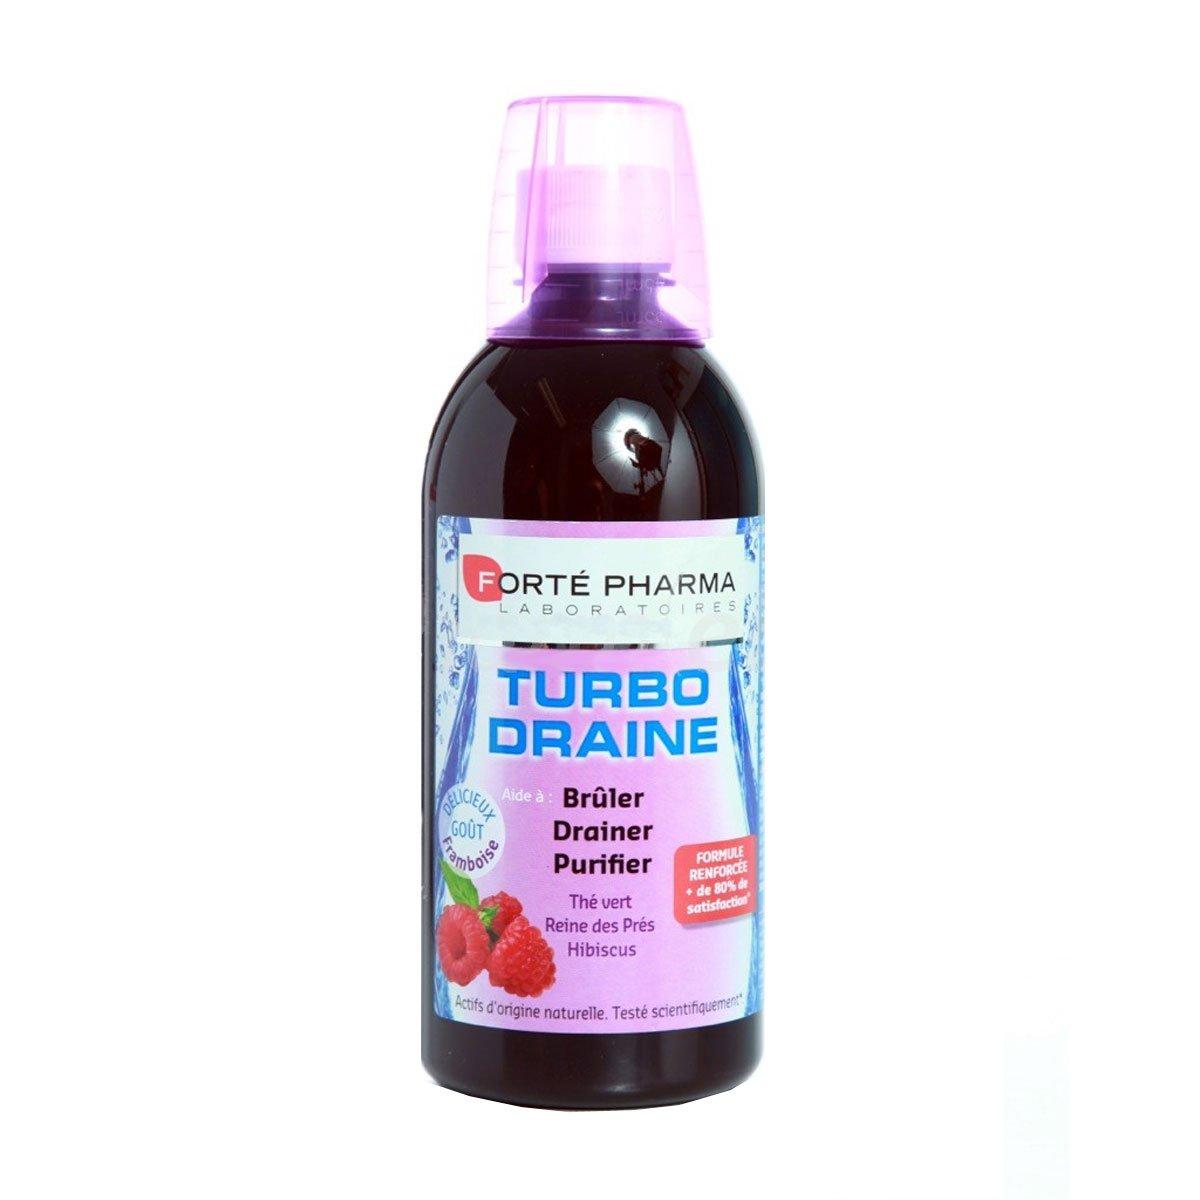 Amazon.com: Forte Pharma Turboslim Drainer Raspeberry 500ml: Health & Personal Care